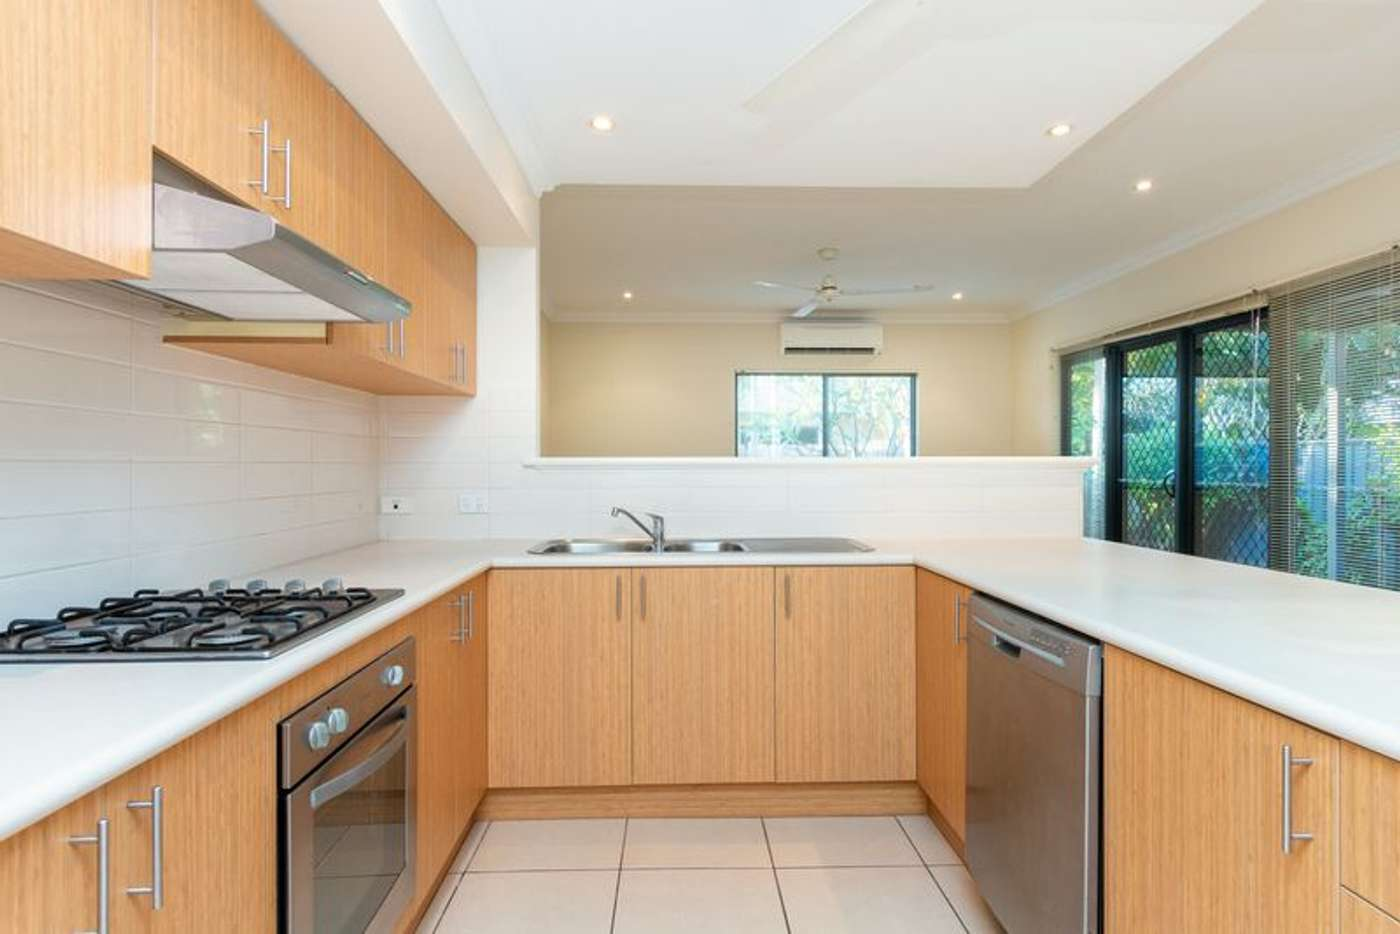 Main view of Homely house listing, 4/6 Ibis Way, Djugun WA 6725